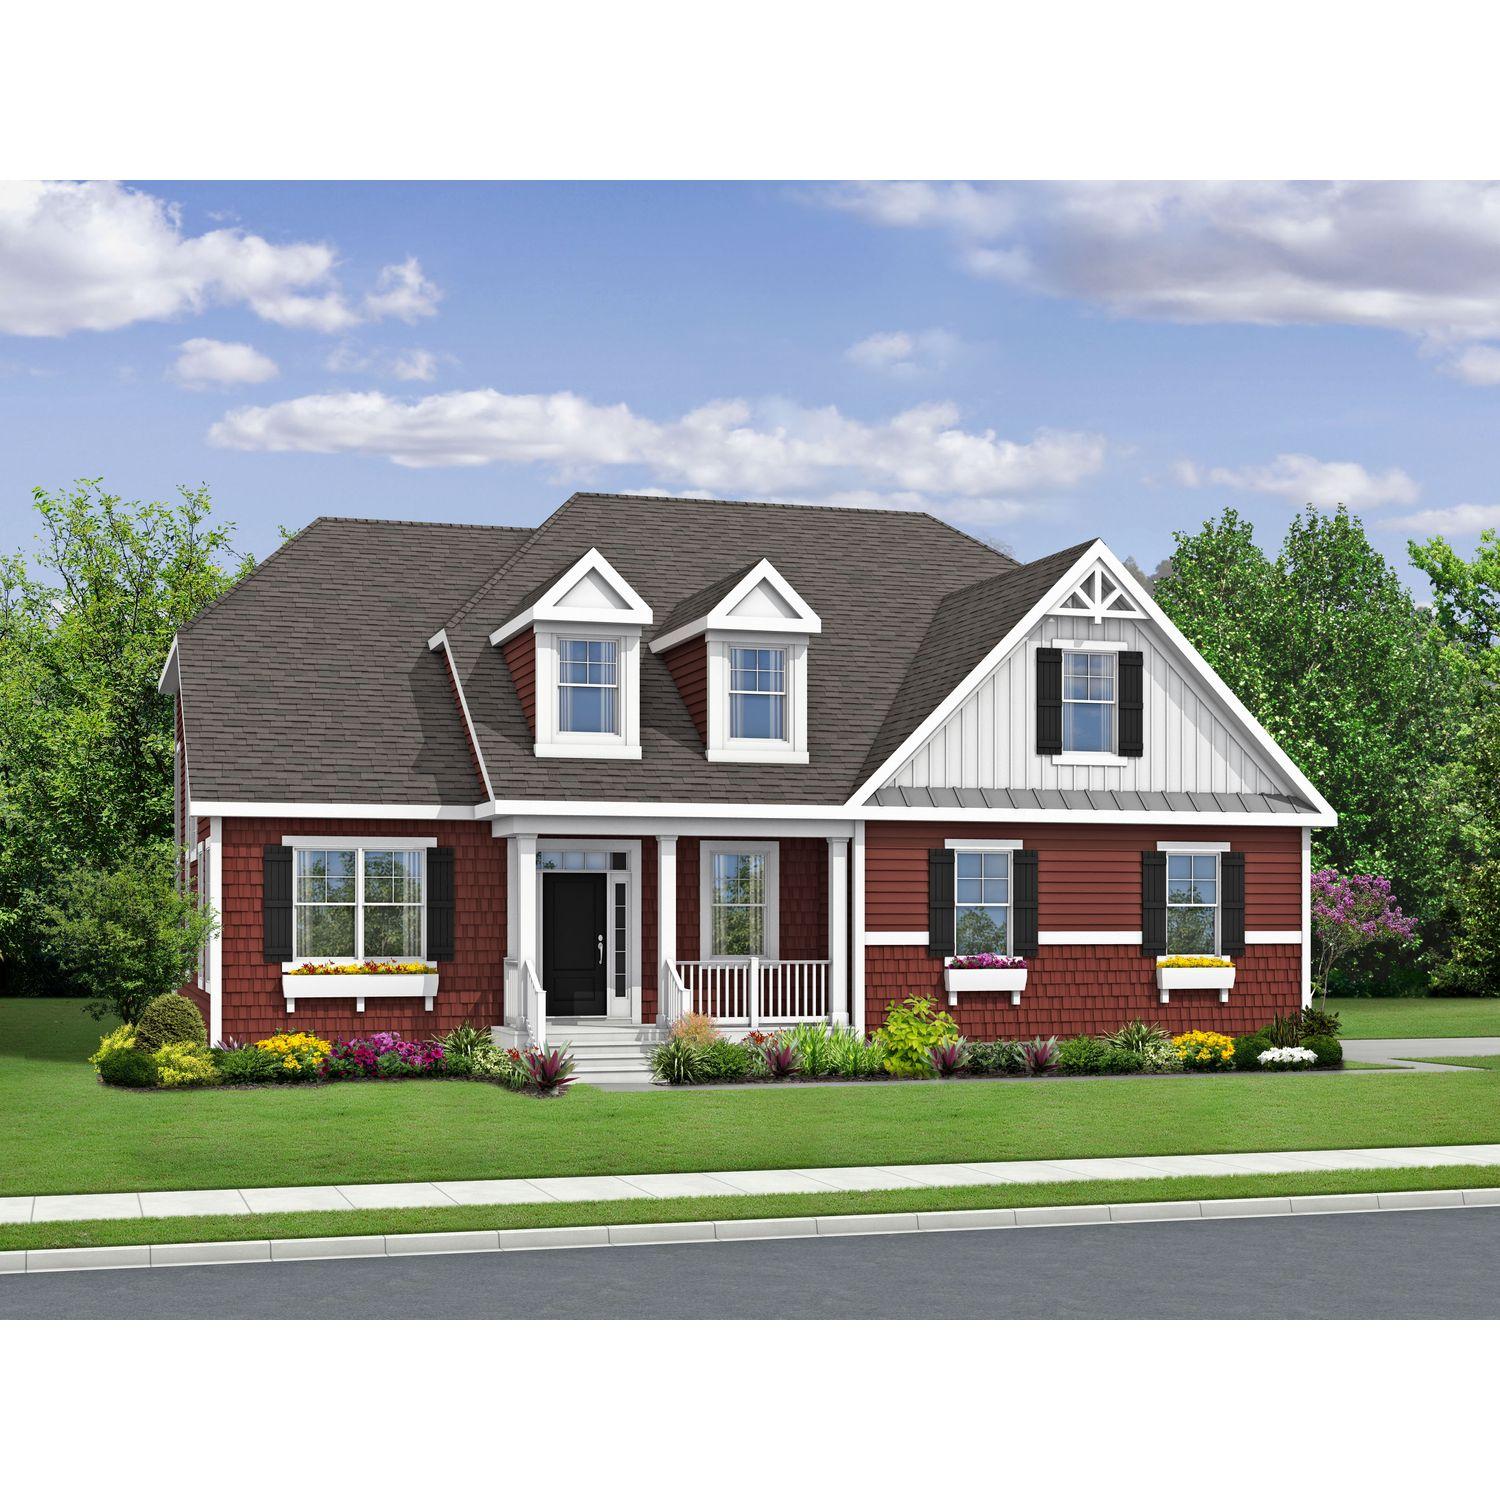 Single Family for Sale at The Shearwater 15924 Garston Lane Midlothian, Virginia 23114 United States